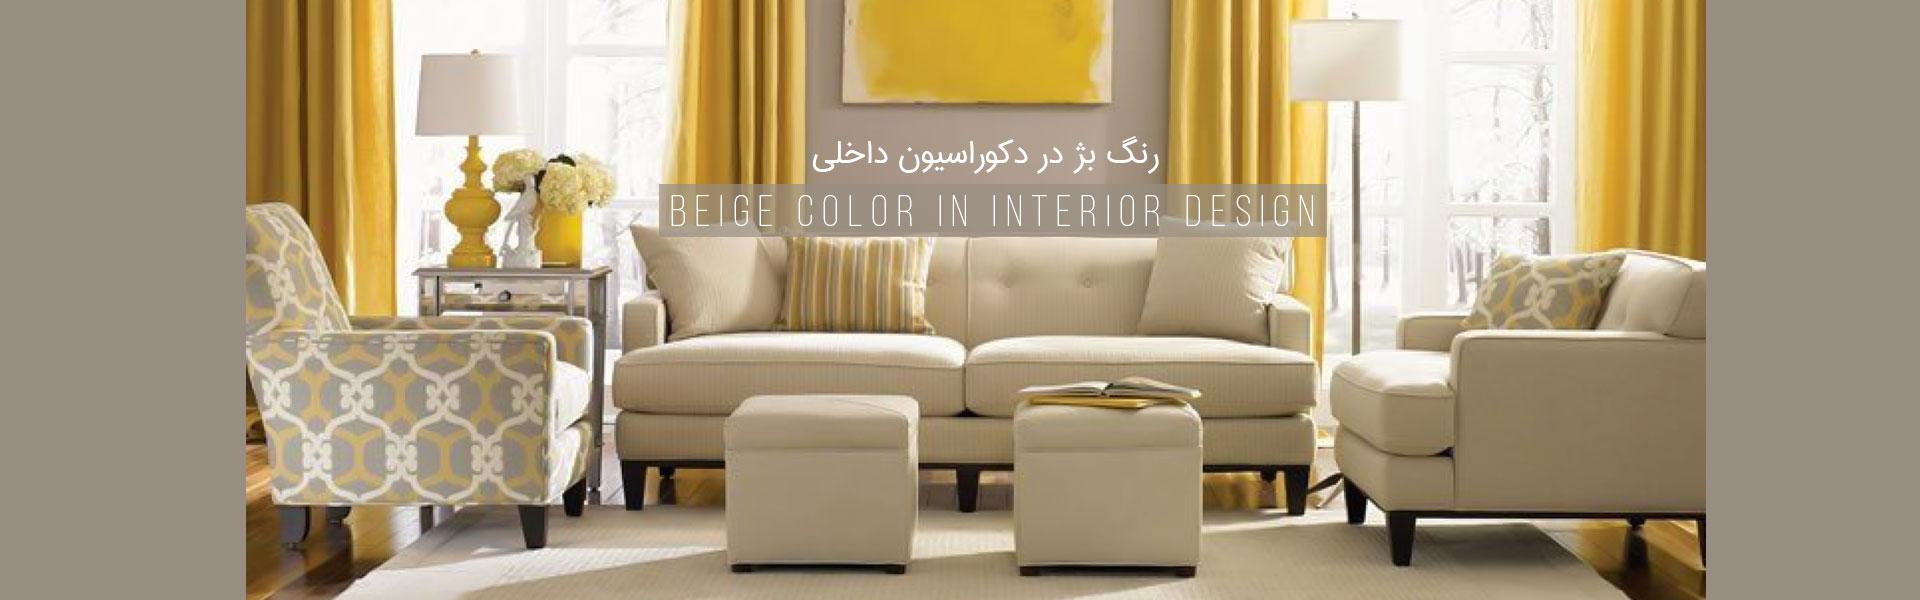 decorasion rang bej2 - رنگ بژ در دکوراسیون داخلی